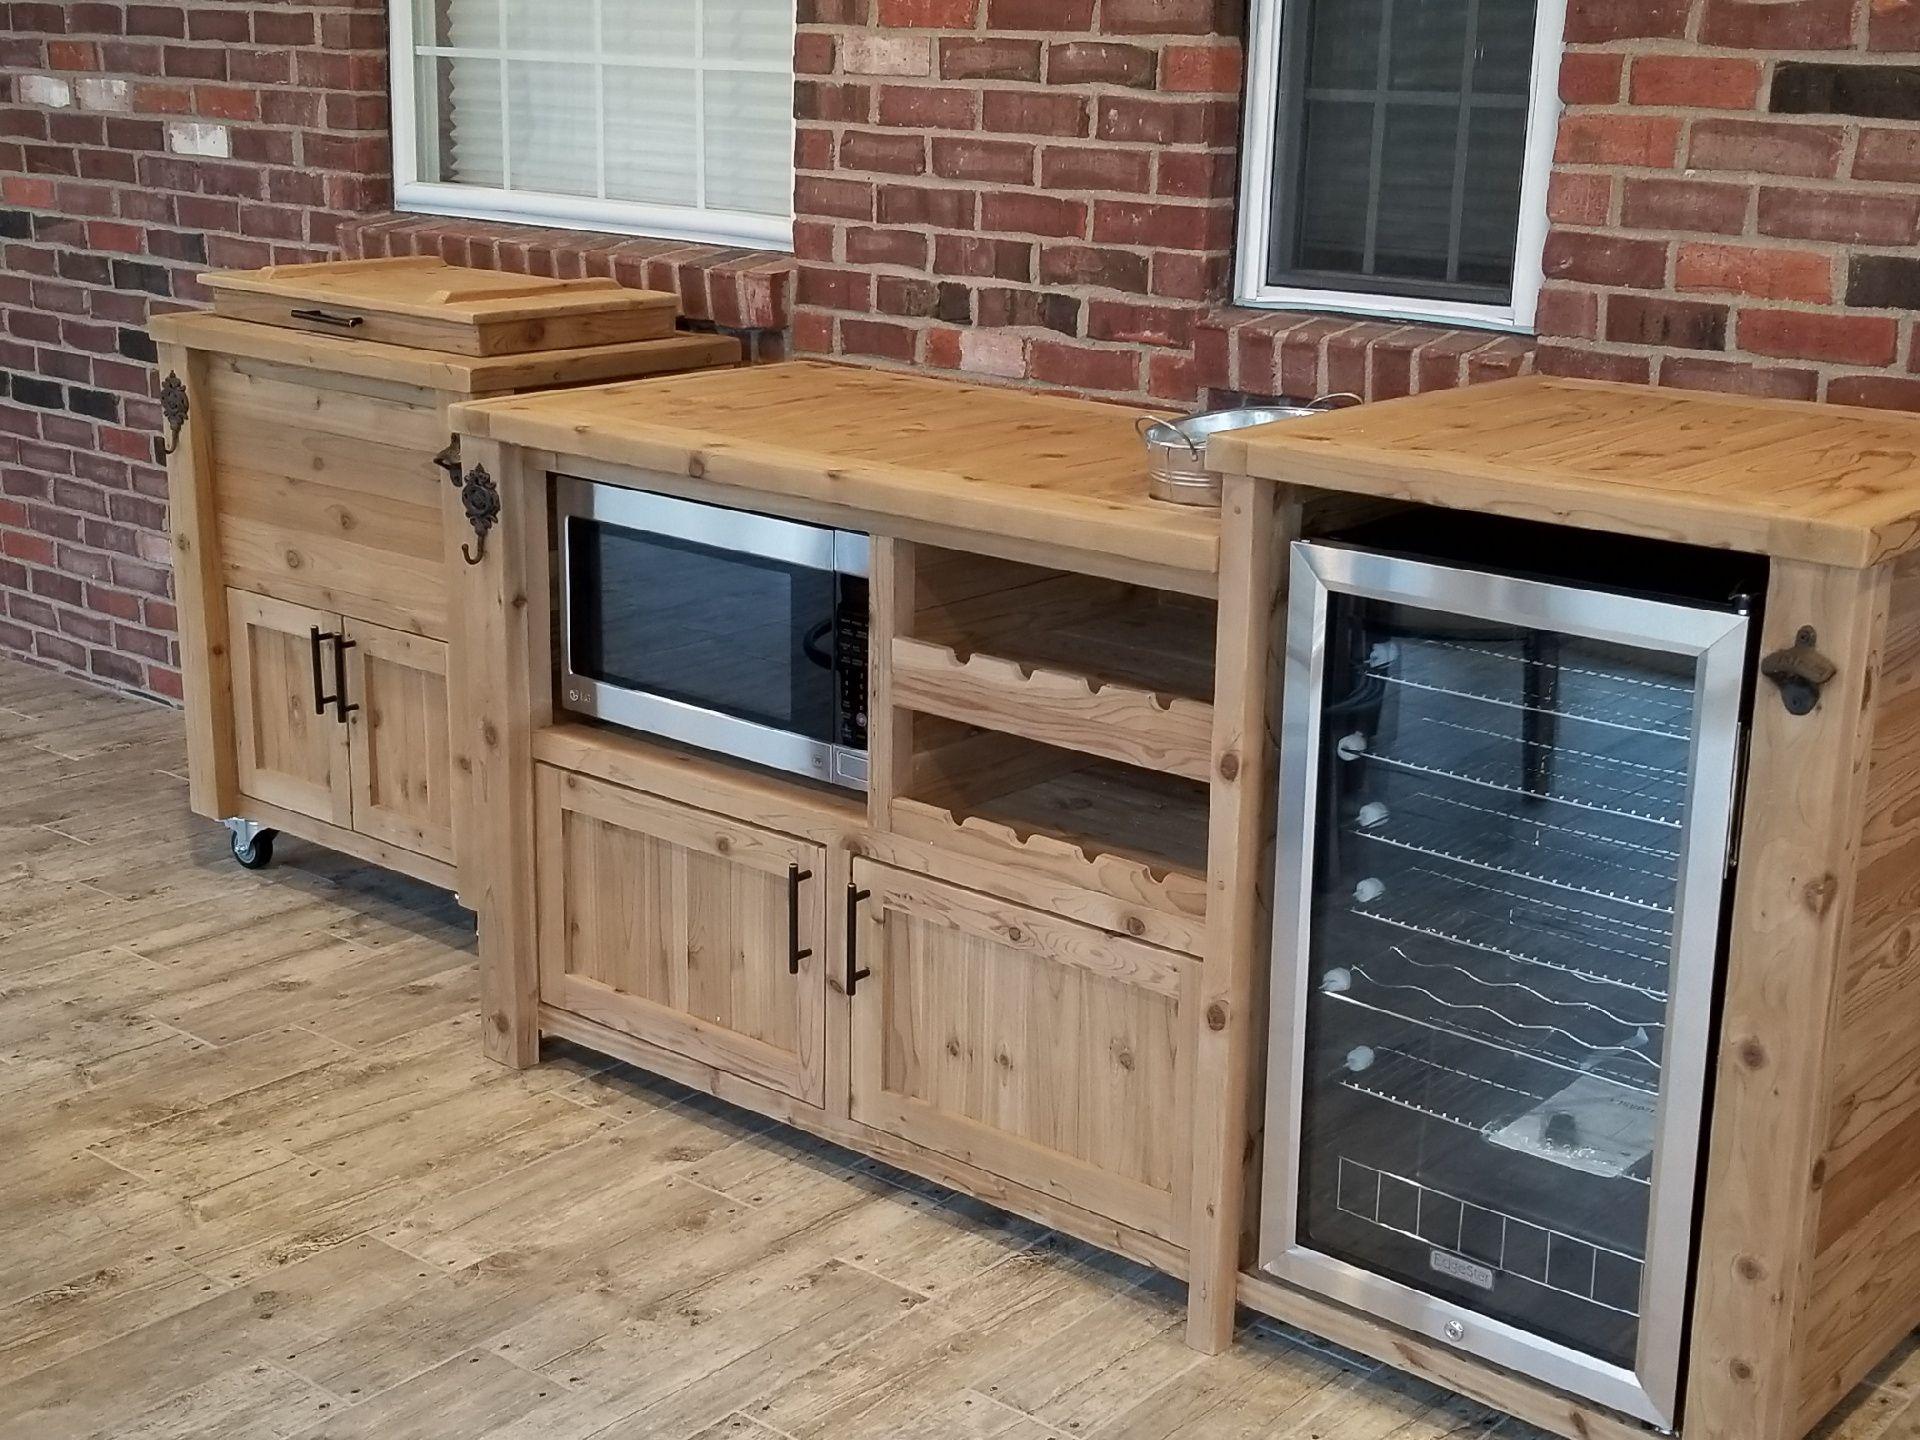 Outdoor Beverage Bar Mini Fridge Microwave Wine Rack And More Outdoor Patio Bar Outdoor Mini Fridge Patio Bar